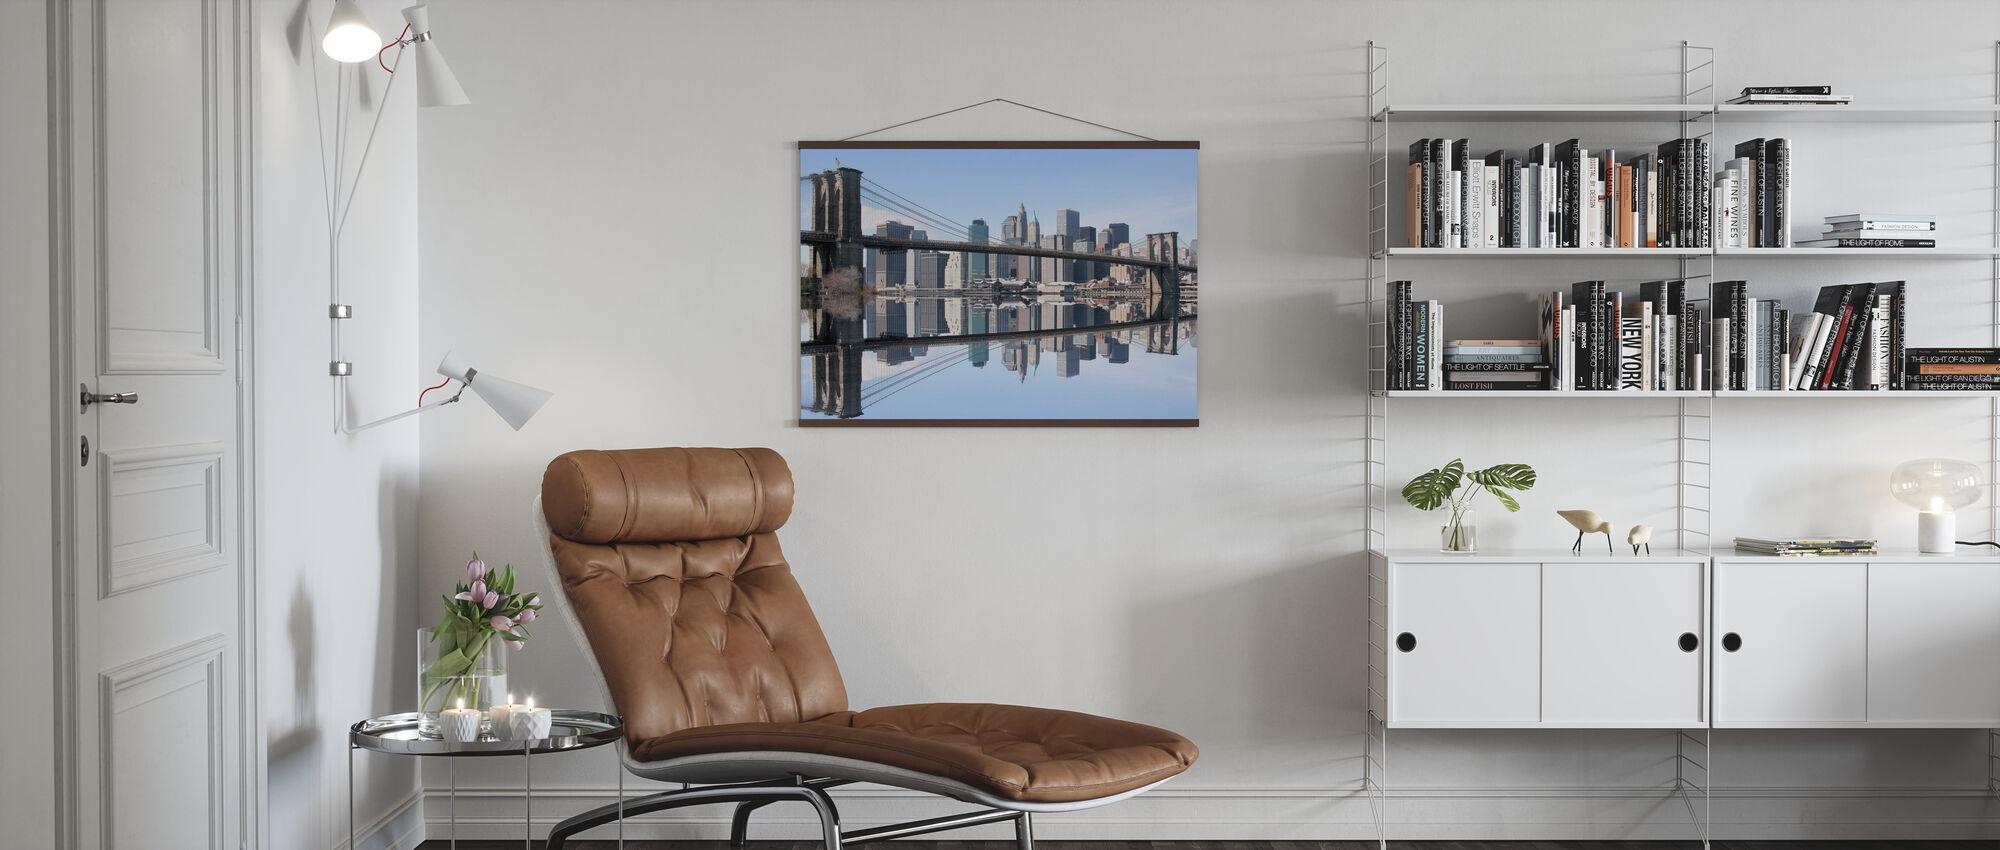 Brooklyn Bridge Clear Blue Day - Poster - Living Room